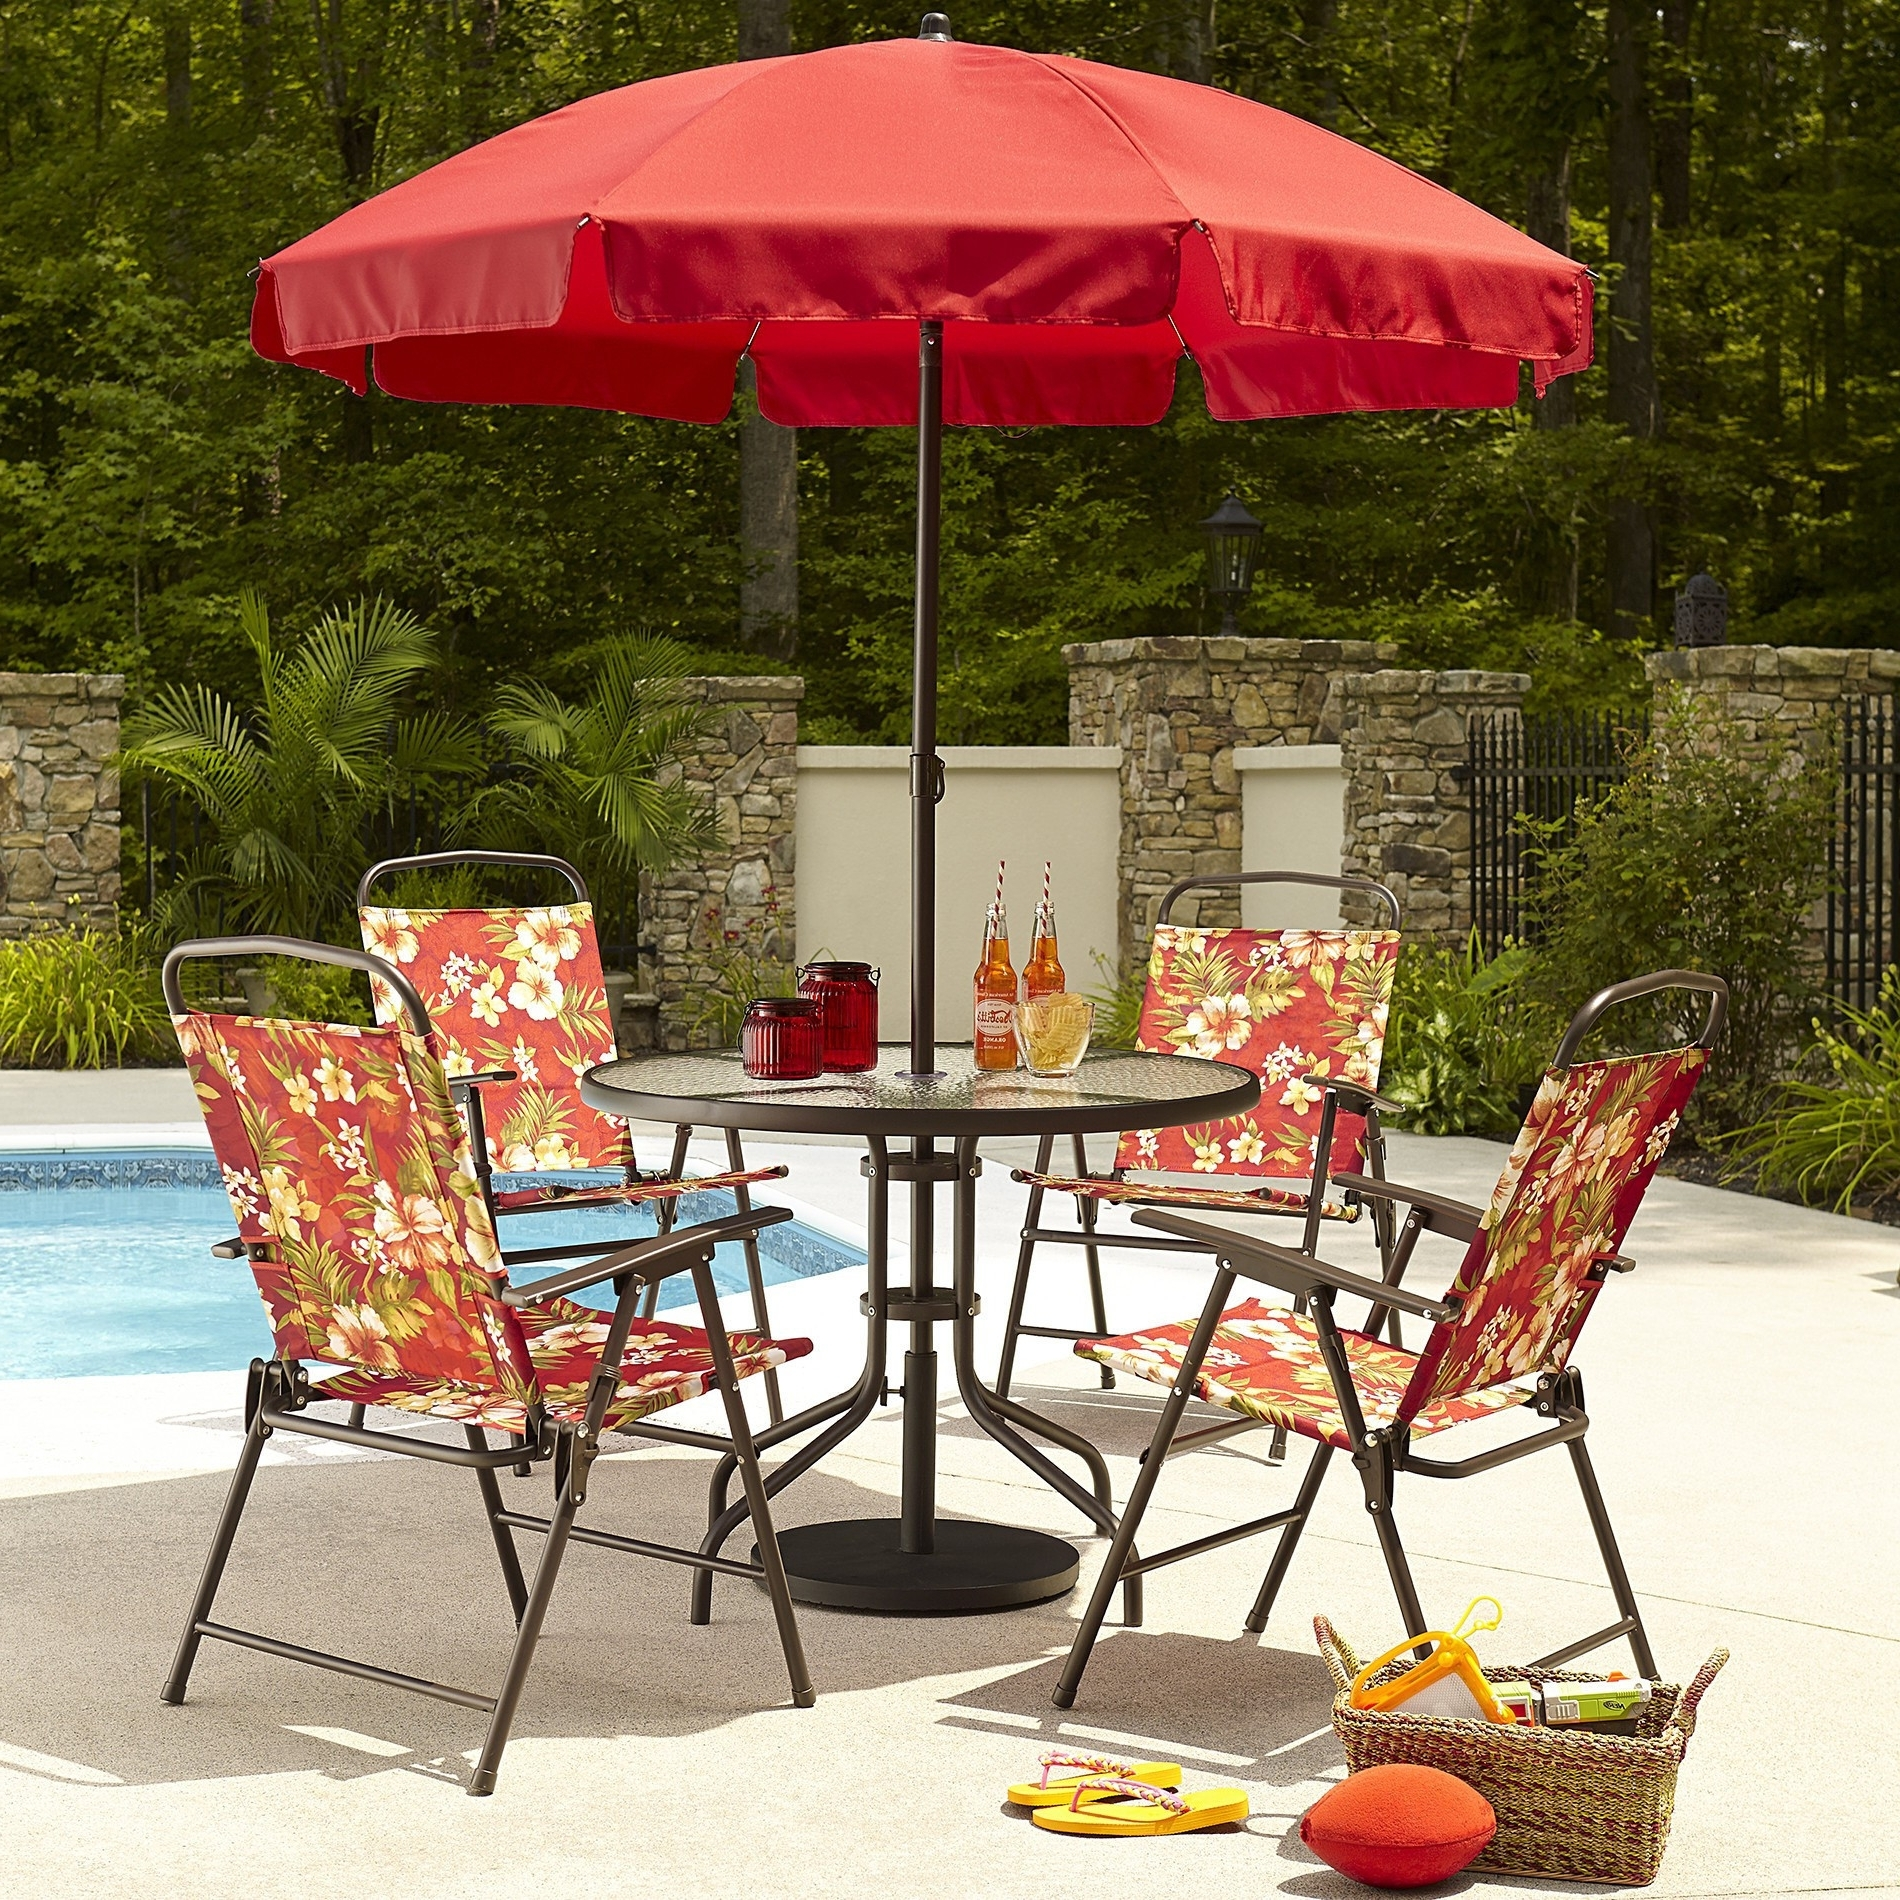 Well Known Costco Outdoor Umbrellas Fresh Costco Beach Umbrella Beautiful With Regard To Patio Umbrellas From Costco (View 19 of 20)